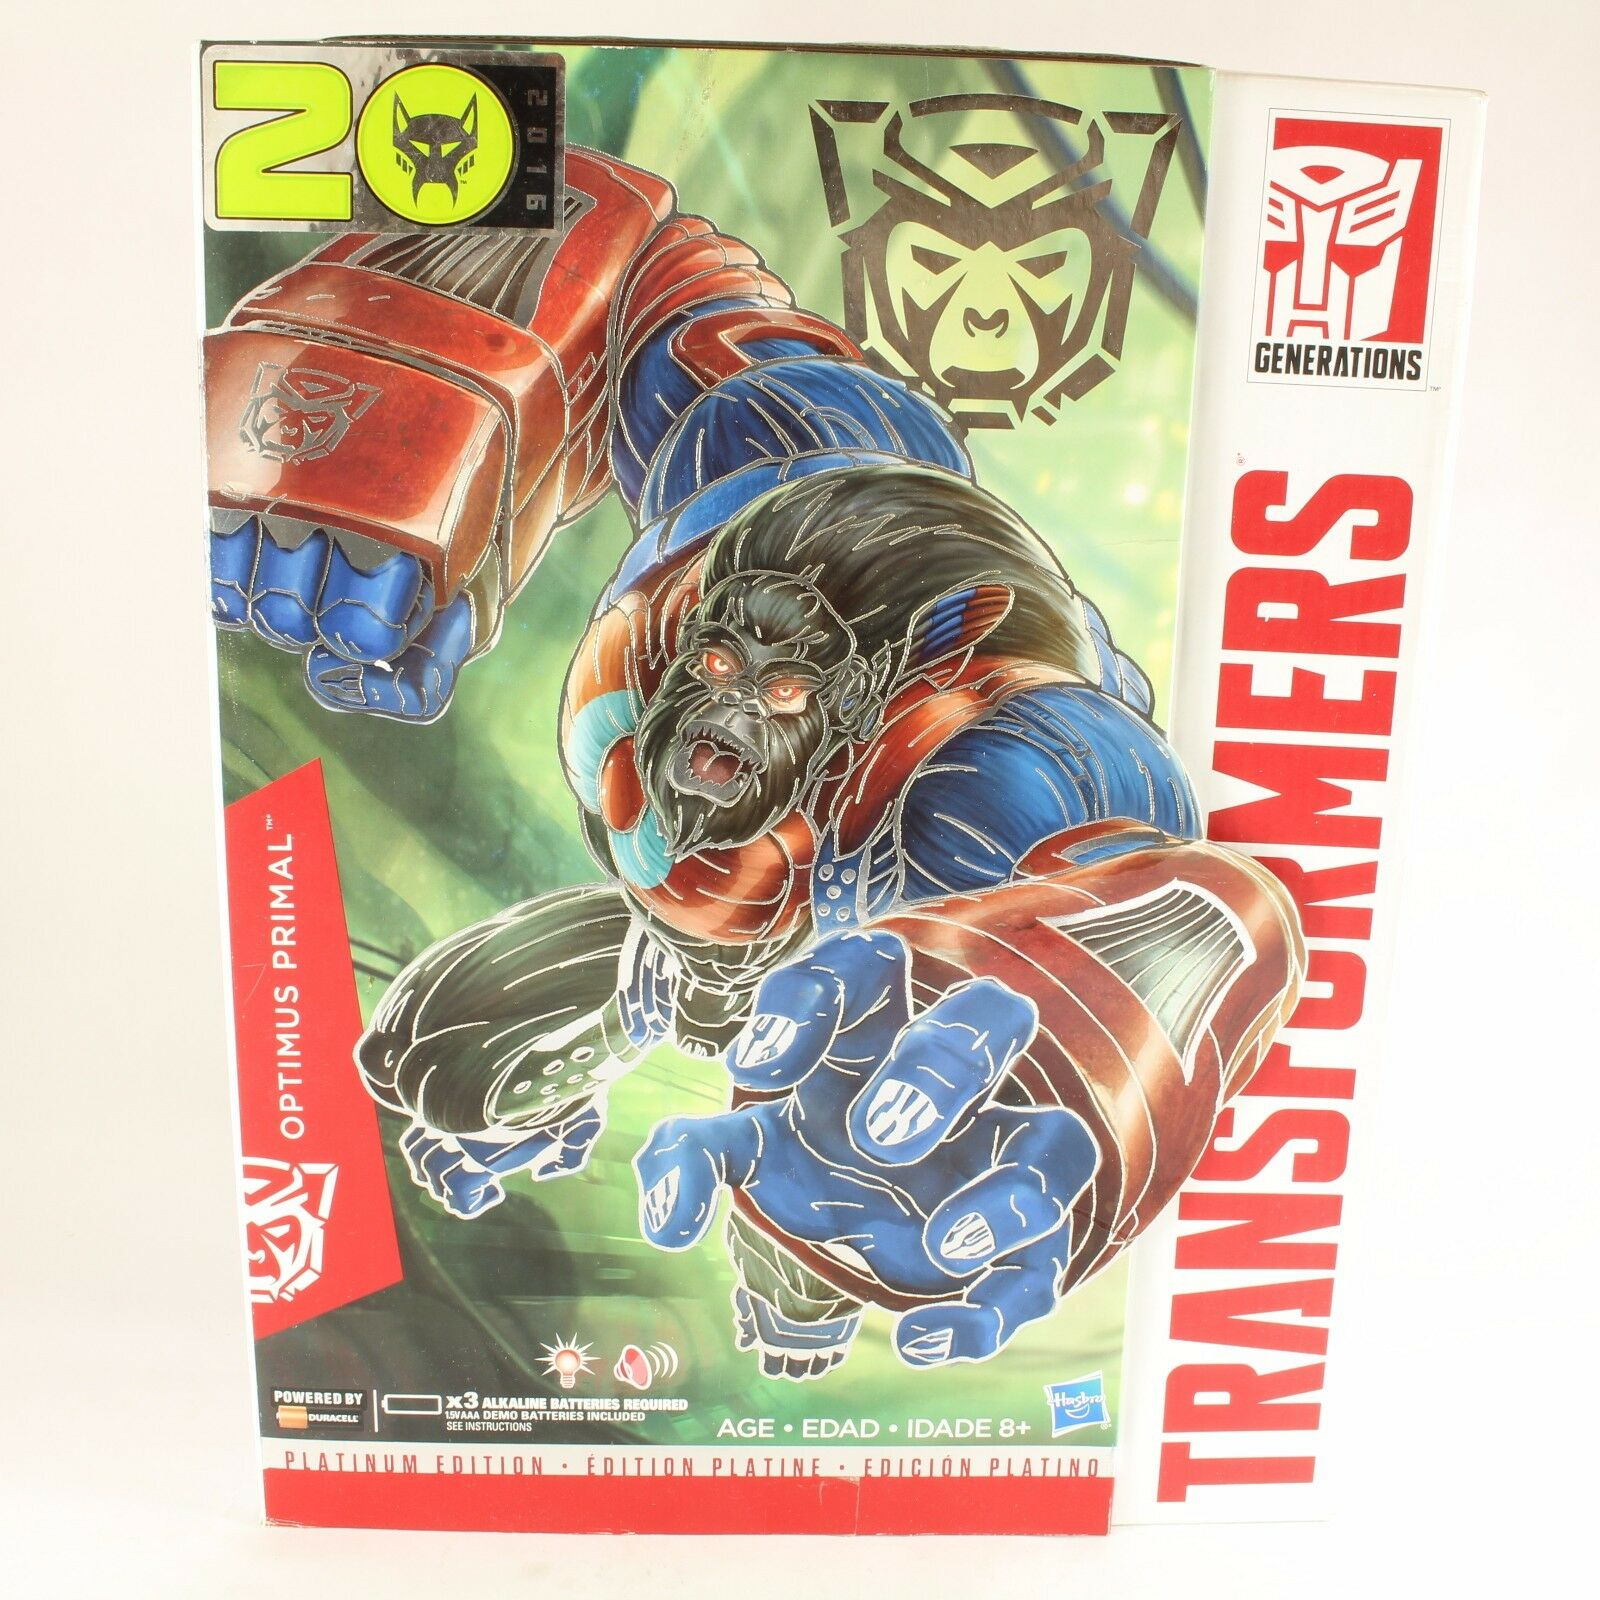 Transformers Masterpiece Platinum Edition Optimus Primal Boxed Complete